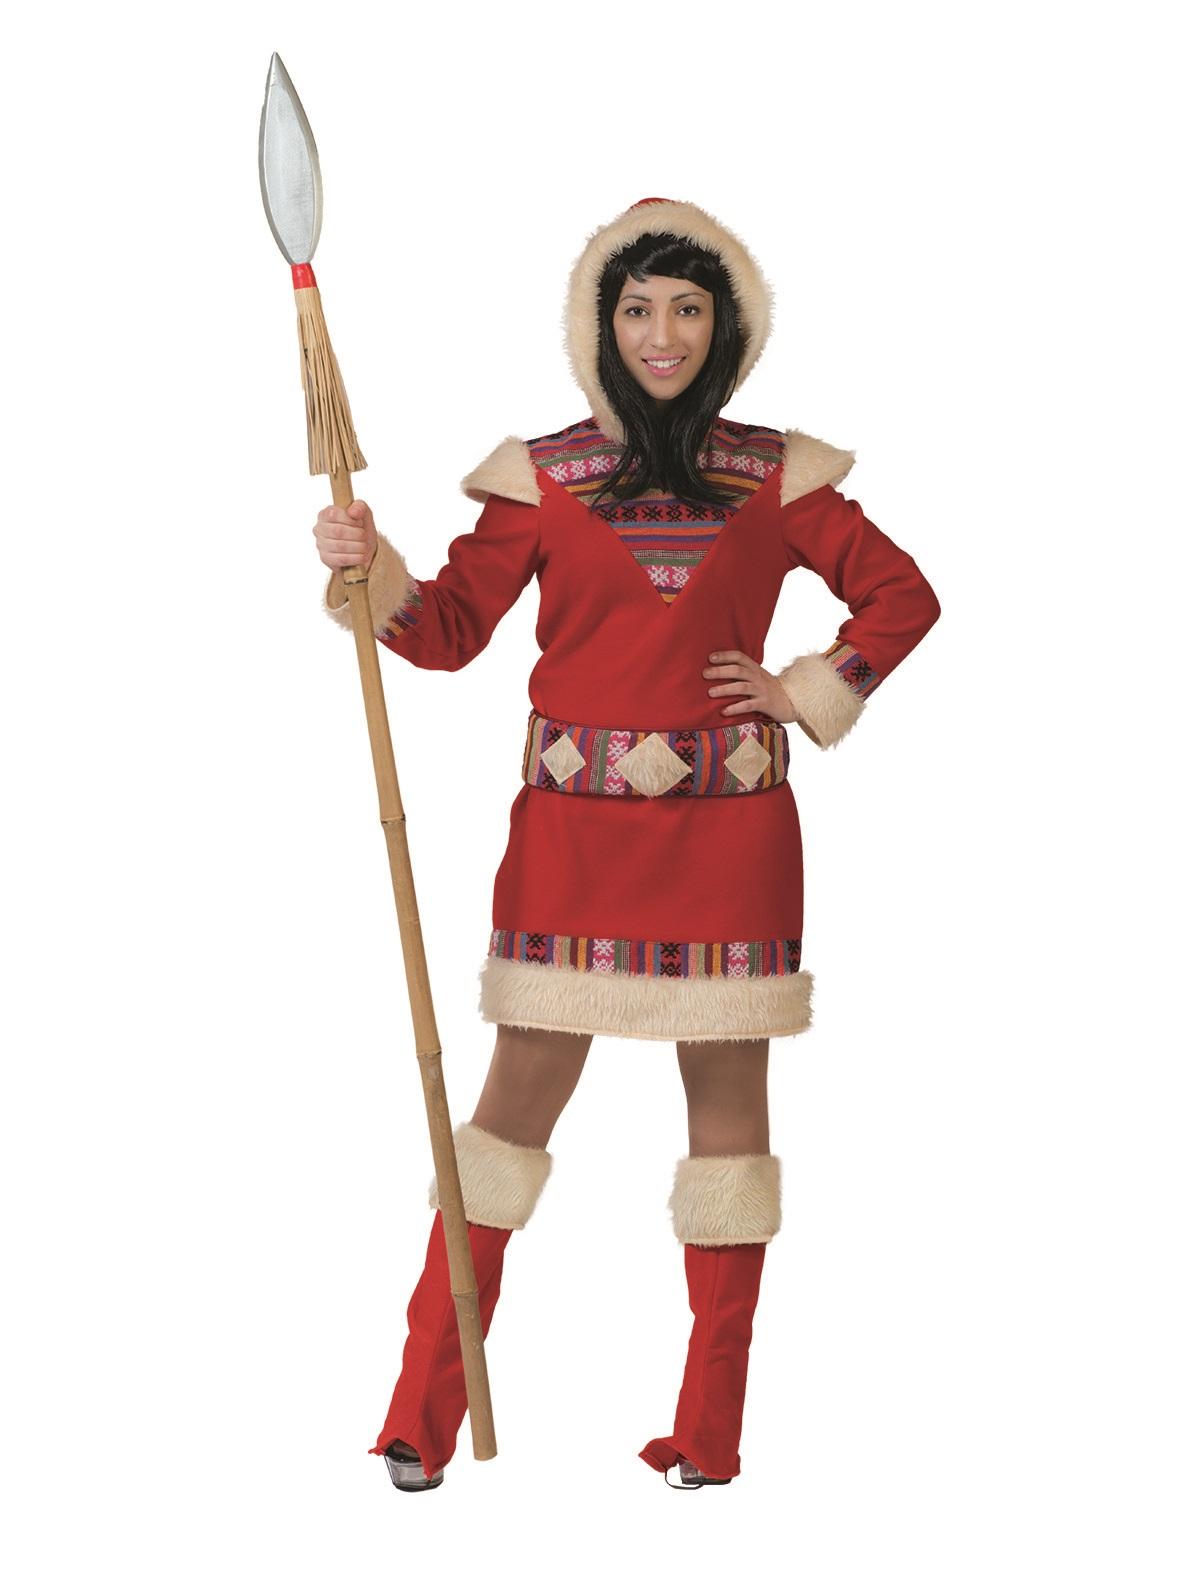 Karneval Kostueme Fasching Nationen Eskimo Damen1lmT75wR48bs2jDUTaTffahp9WI